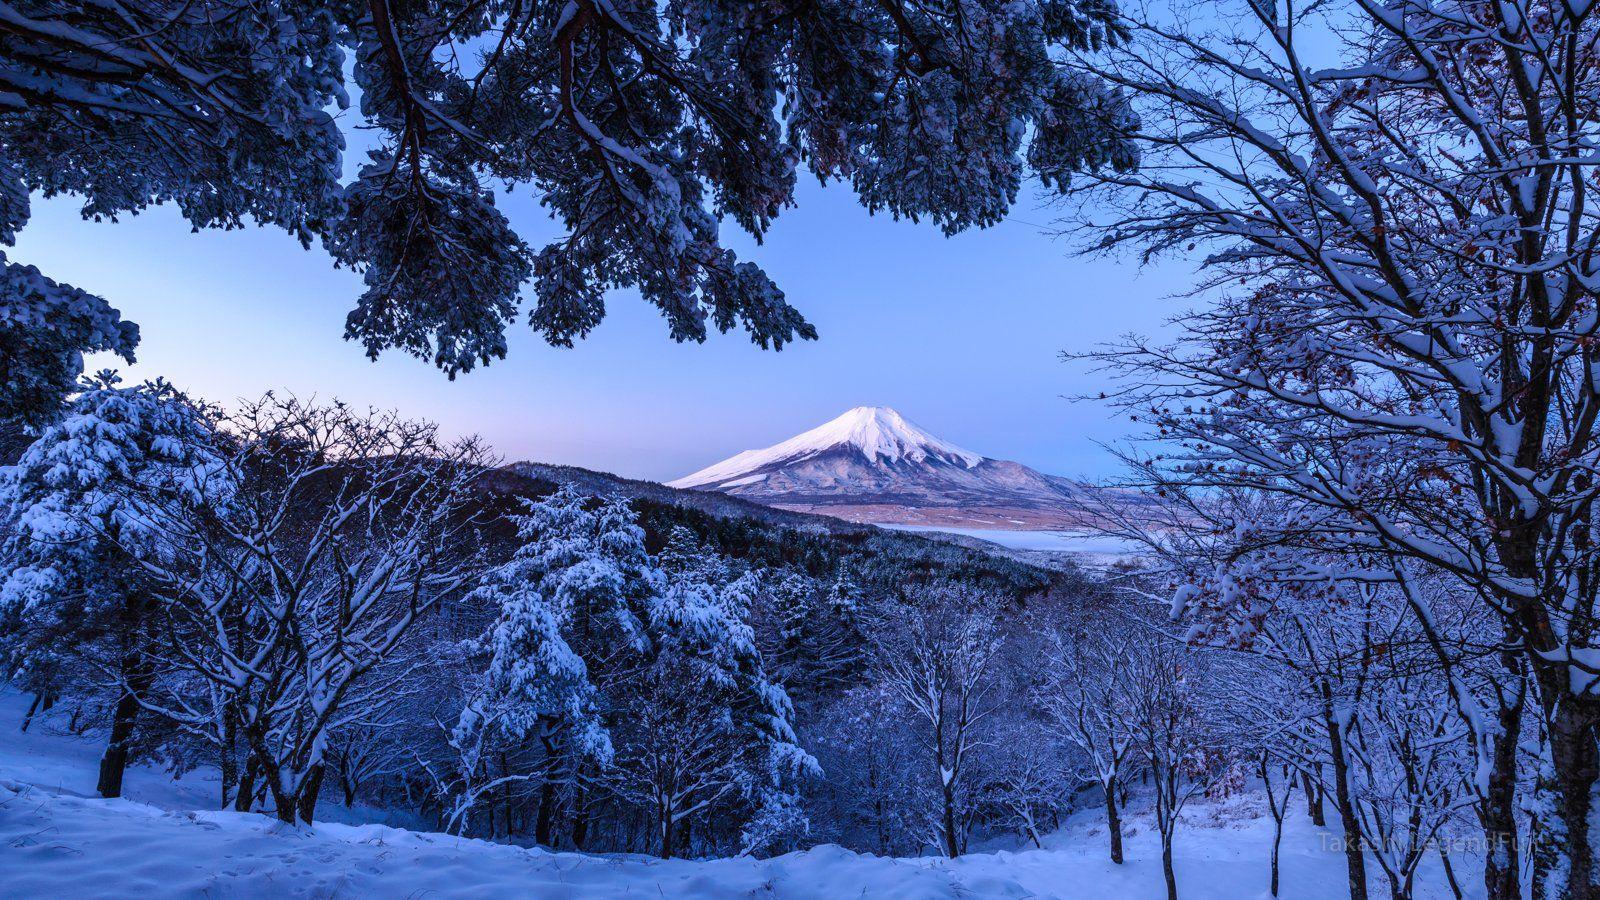 Fuji,mountain,Japan,snow,forest,tree,dawn,blue,morning,beautiful,landscape,, Takashi